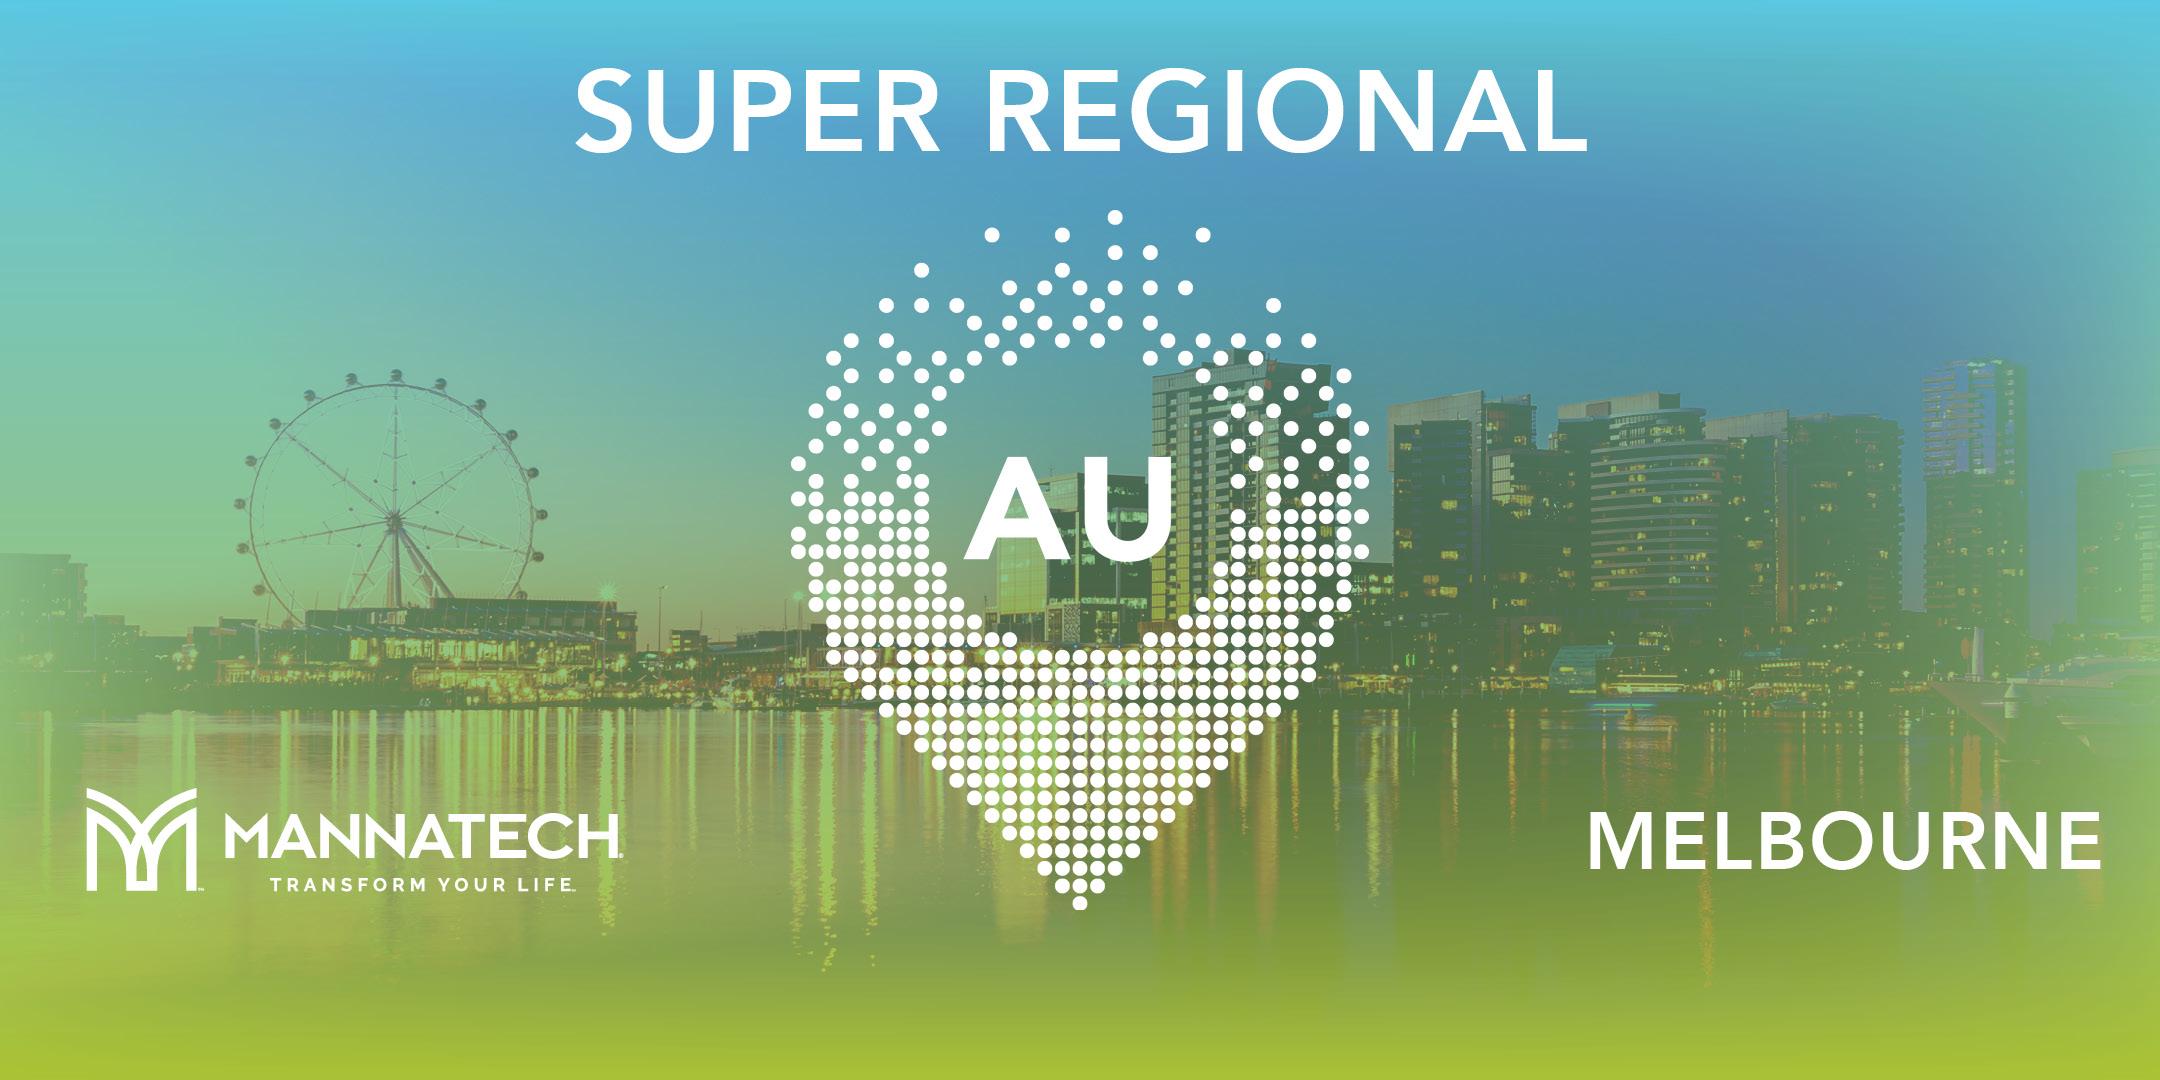 Melbourne Super Regional